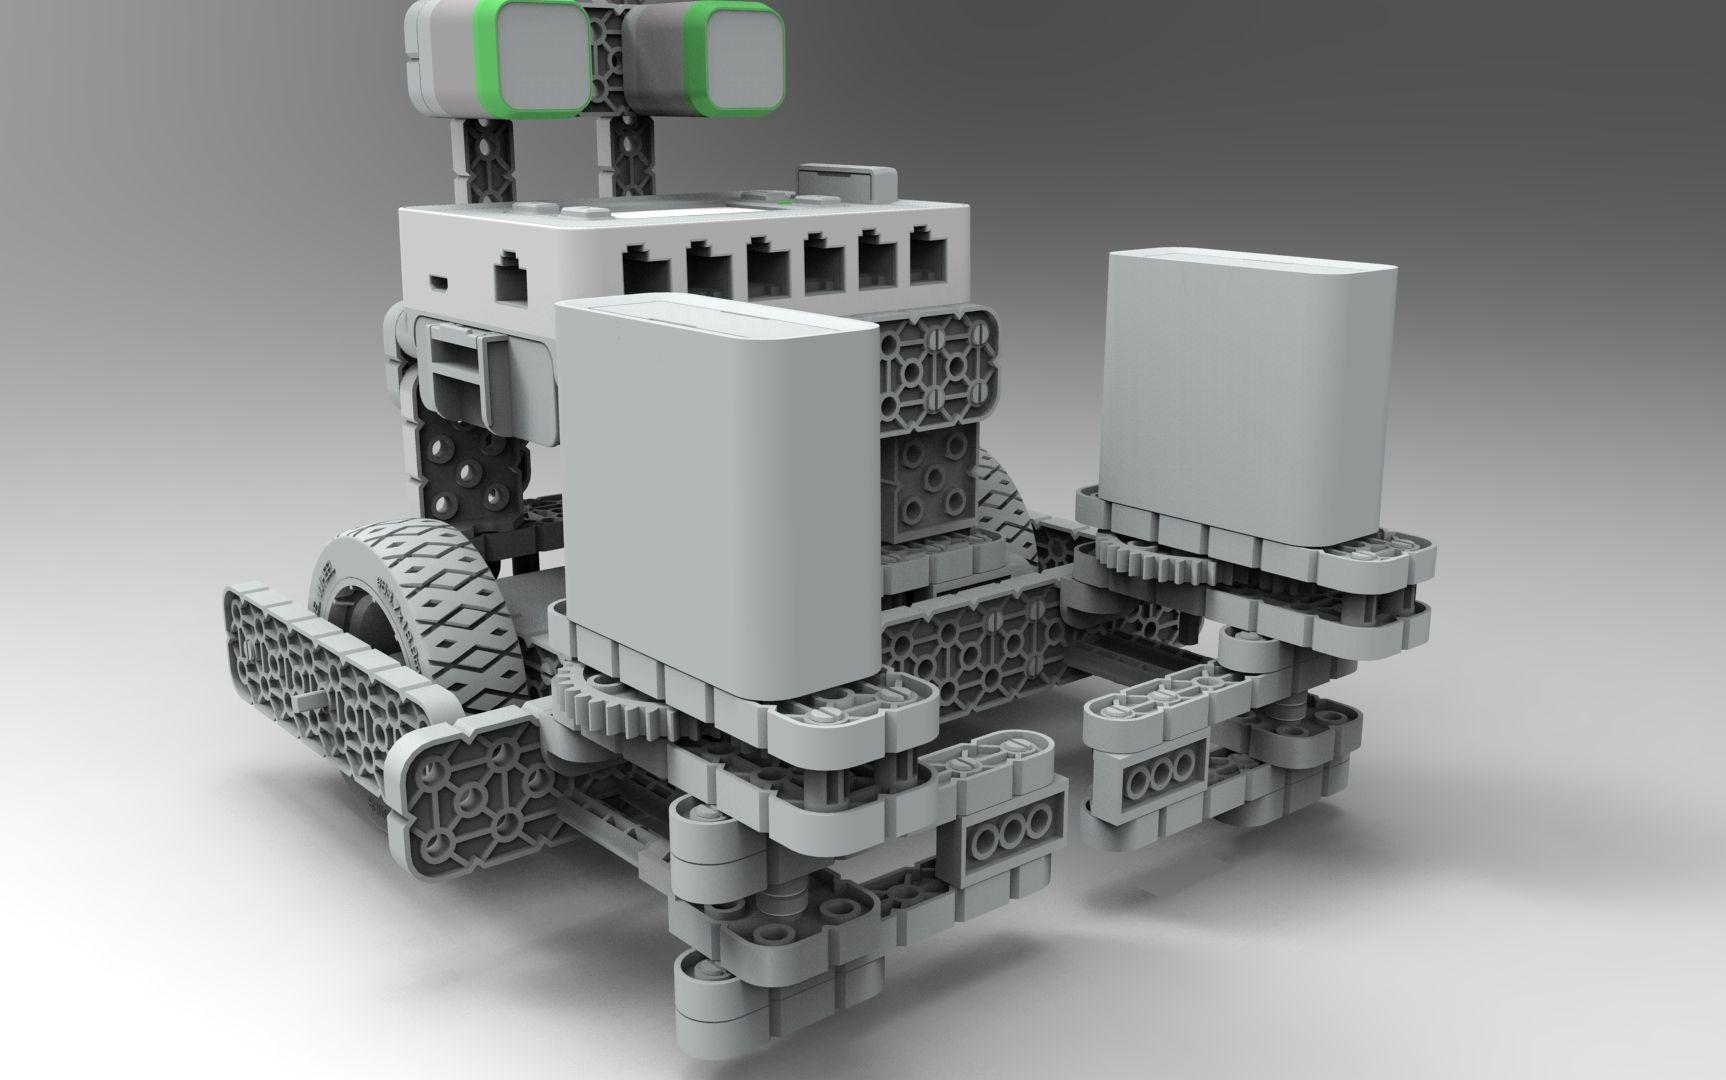 Fabrica-de-nerdes-vex-iq-lucas2-3500-3500